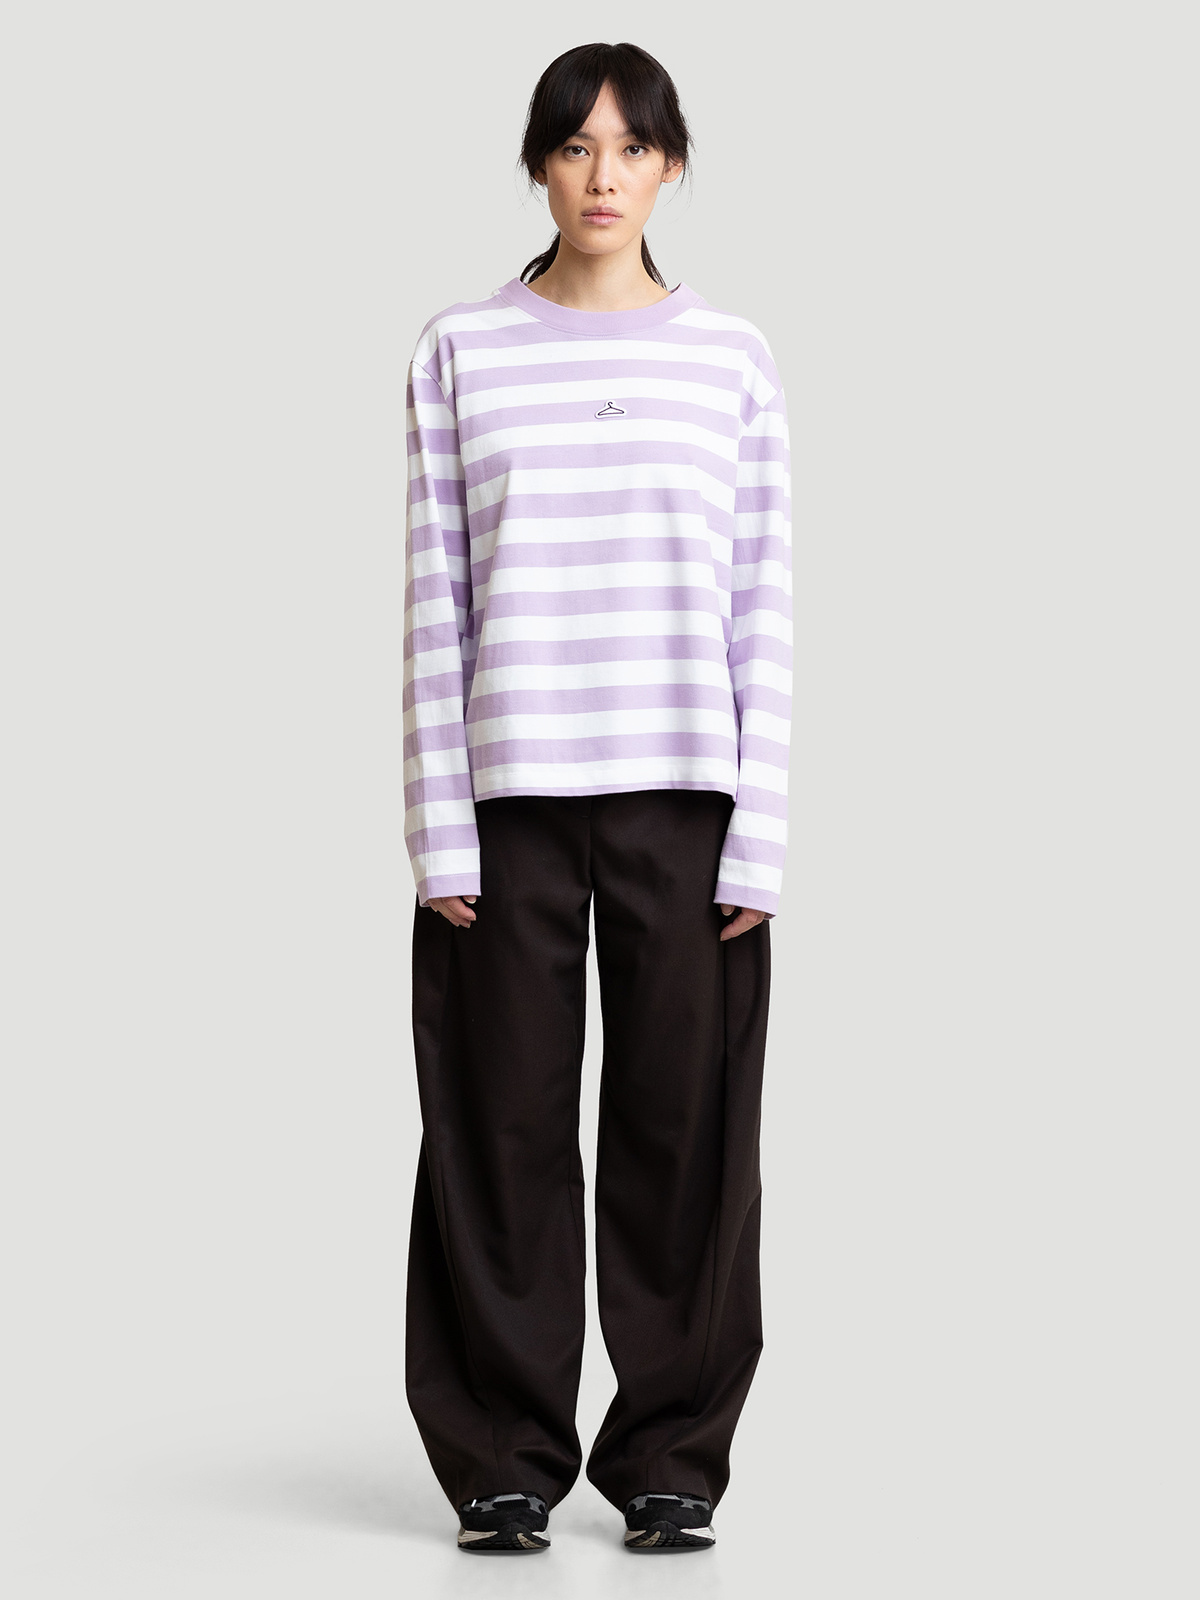 Hanger Striped Longsleeve Lilac White 9